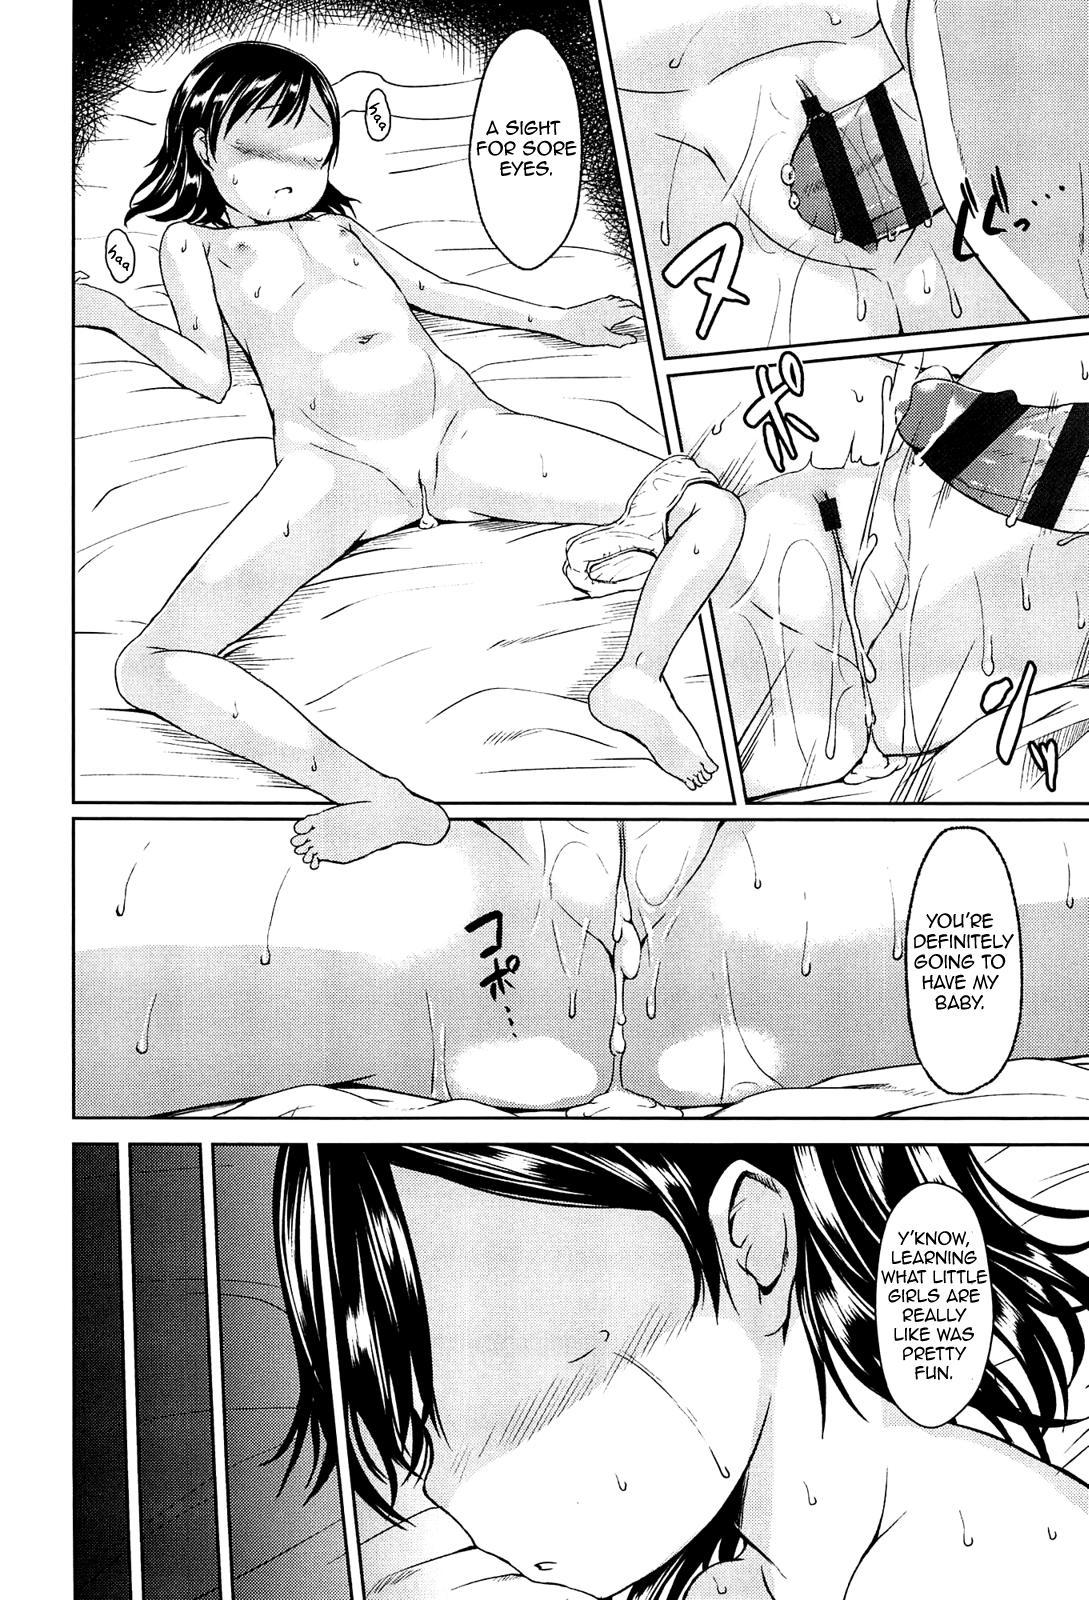 [Misao.] Hajimete Janai yo?   It's not Your First Time? [English] {5 a.m.} + [Rin] 126